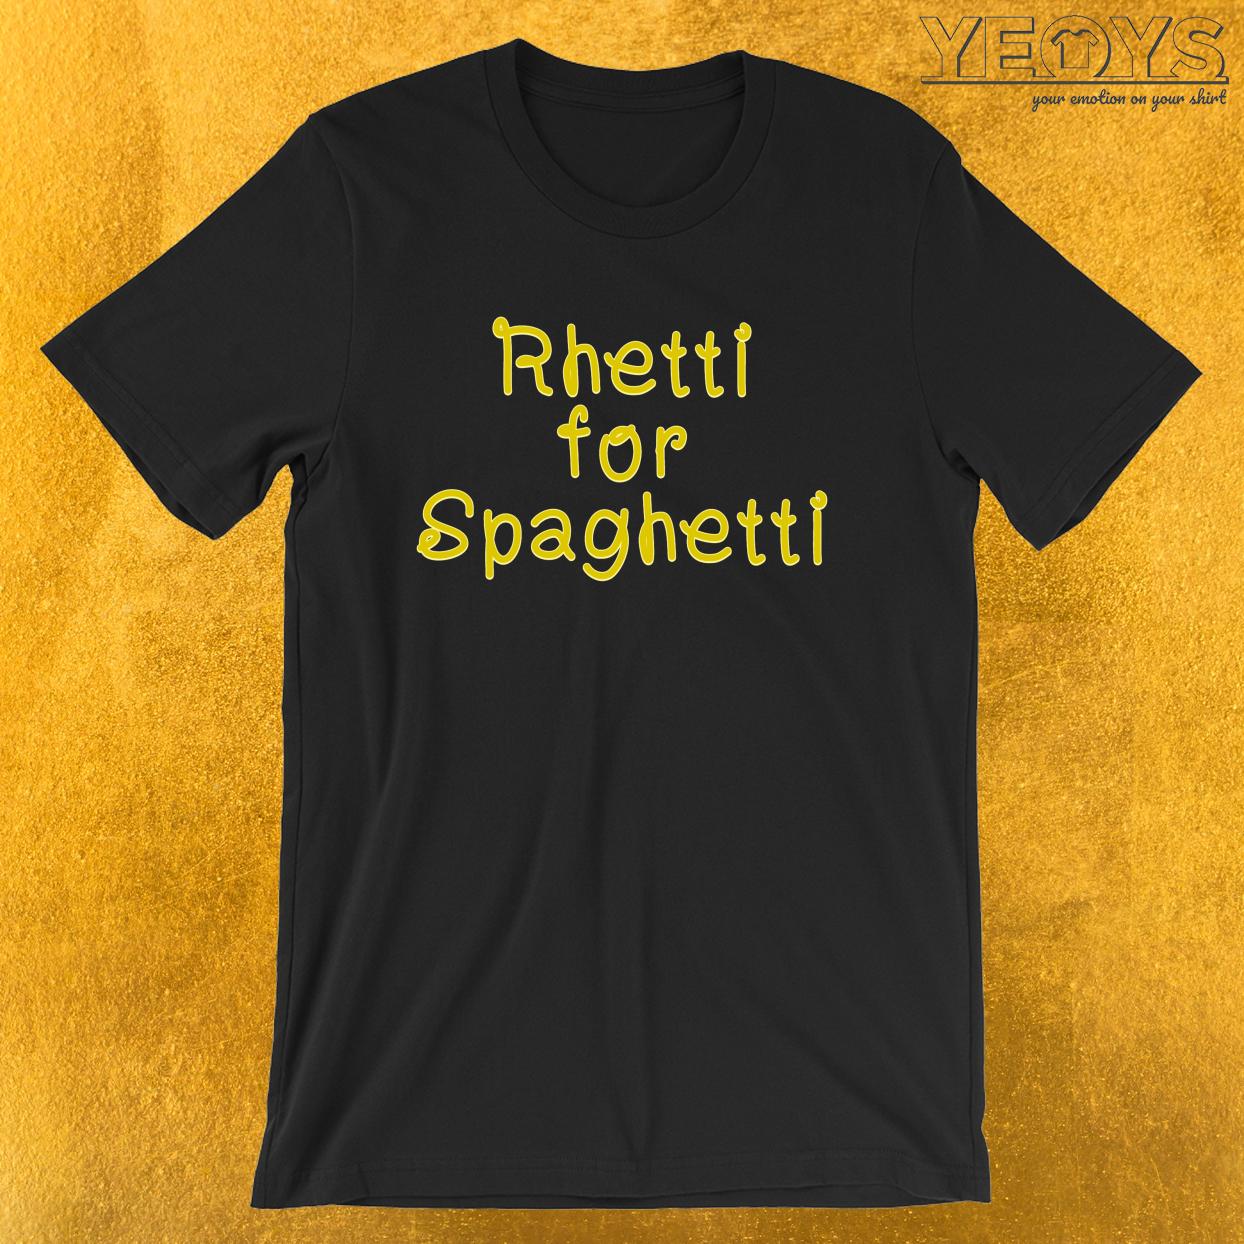 Rhetti For Spaghetti – Funny I Love Italian Pasta Tee